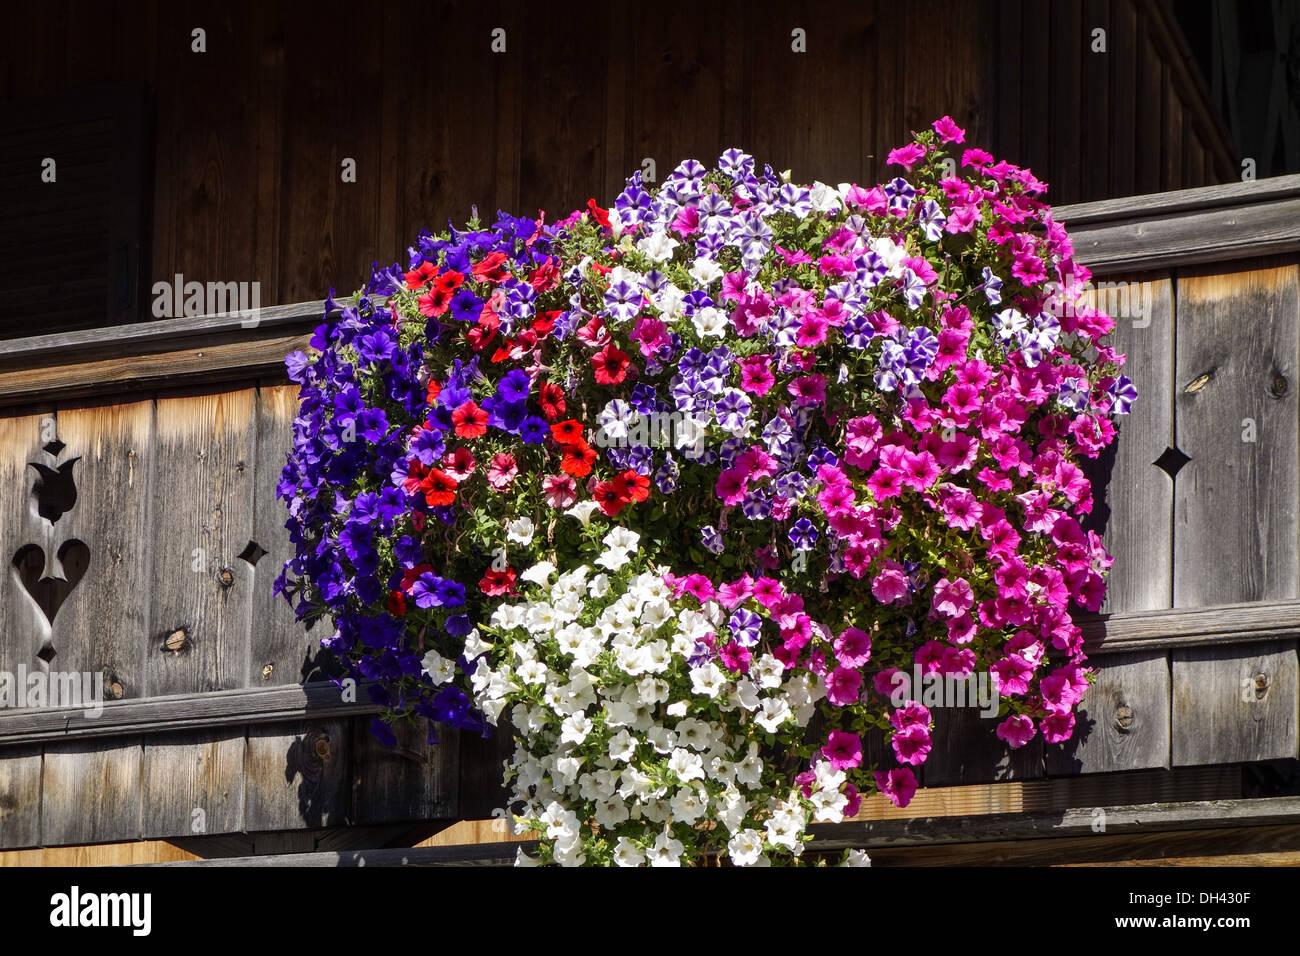 kochel am see kochelsee balkonblumen an einem bauernhaus bayern stock photo 62170431 alamy. Black Bedroom Furniture Sets. Home Design Ideas